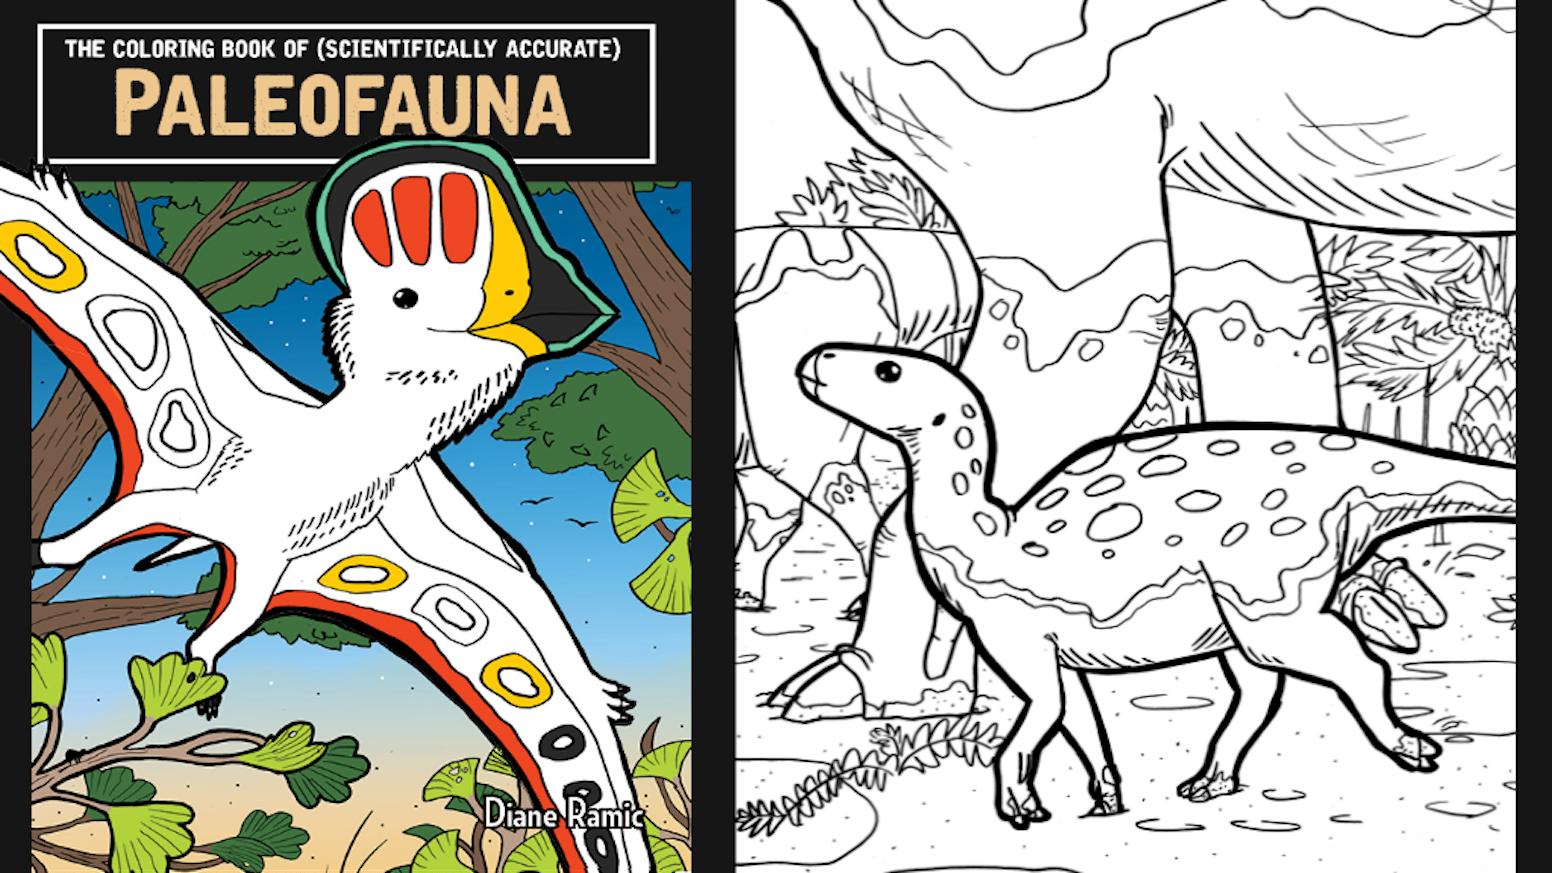 The Coloring Book of PaleoFauna! by Diane Ramic — Kickstarter